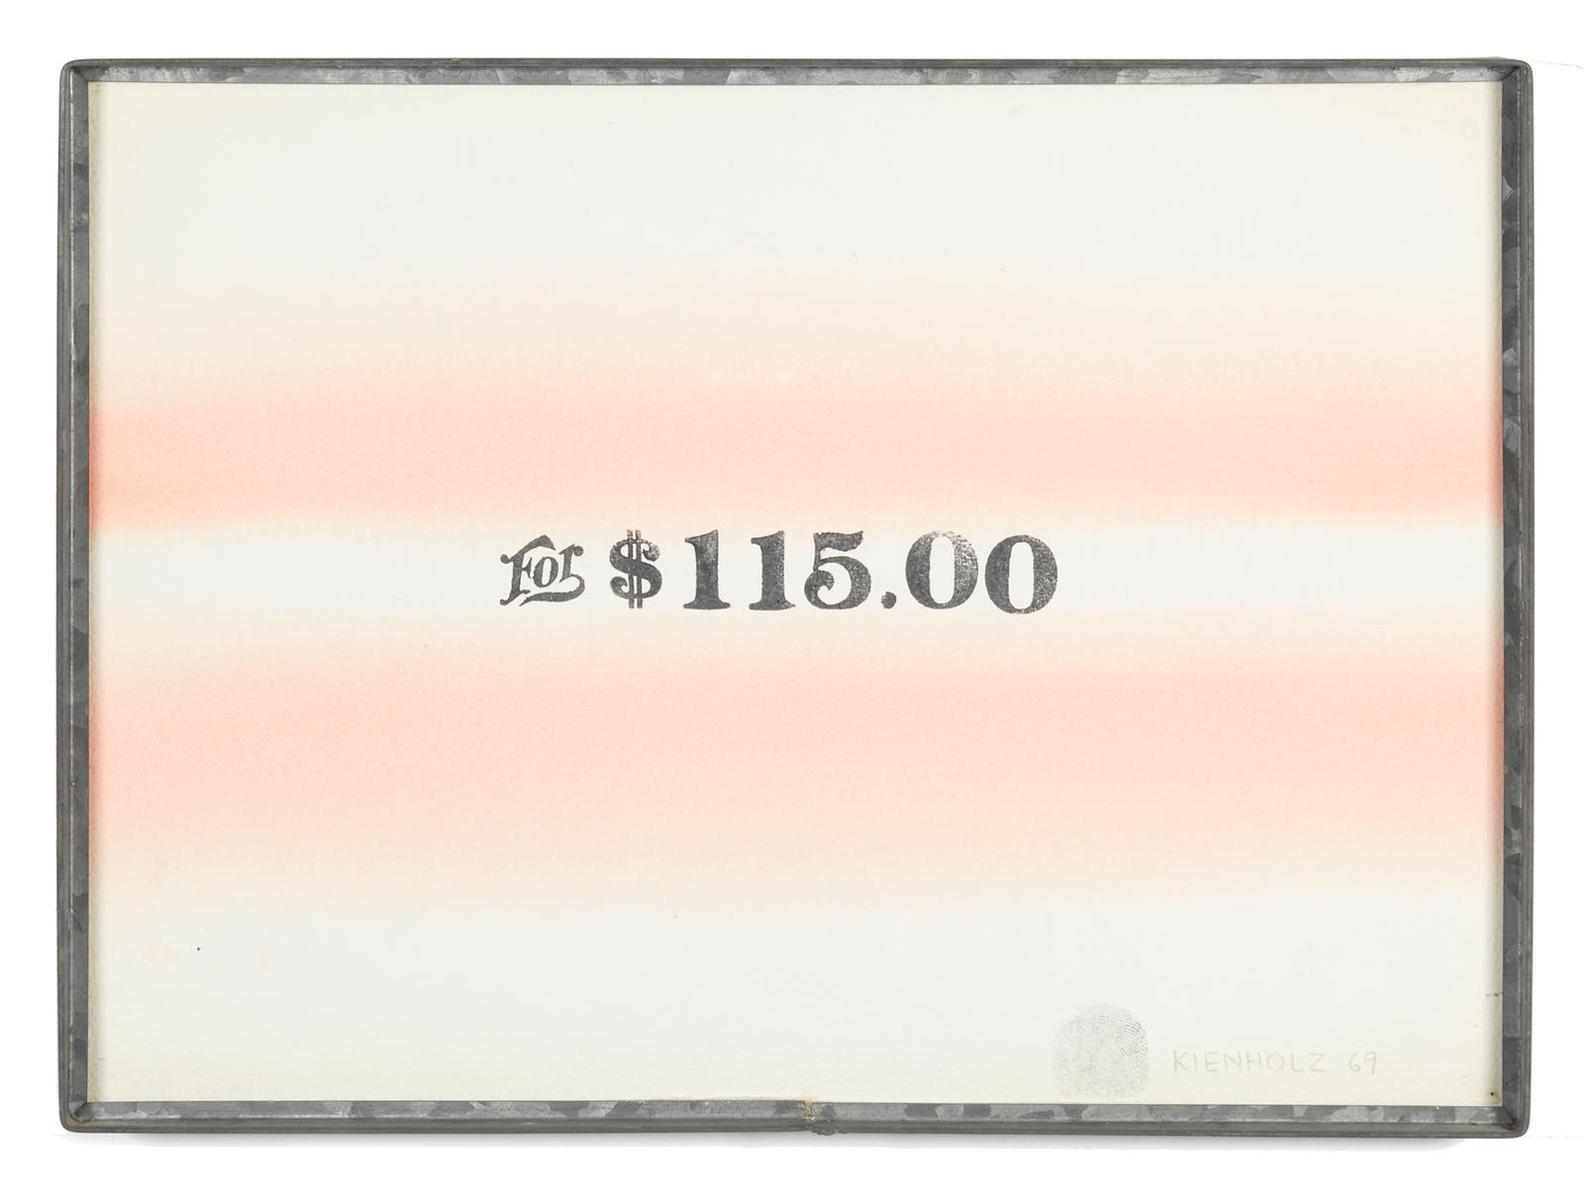 Edward Kienholz-For $115.00-1969